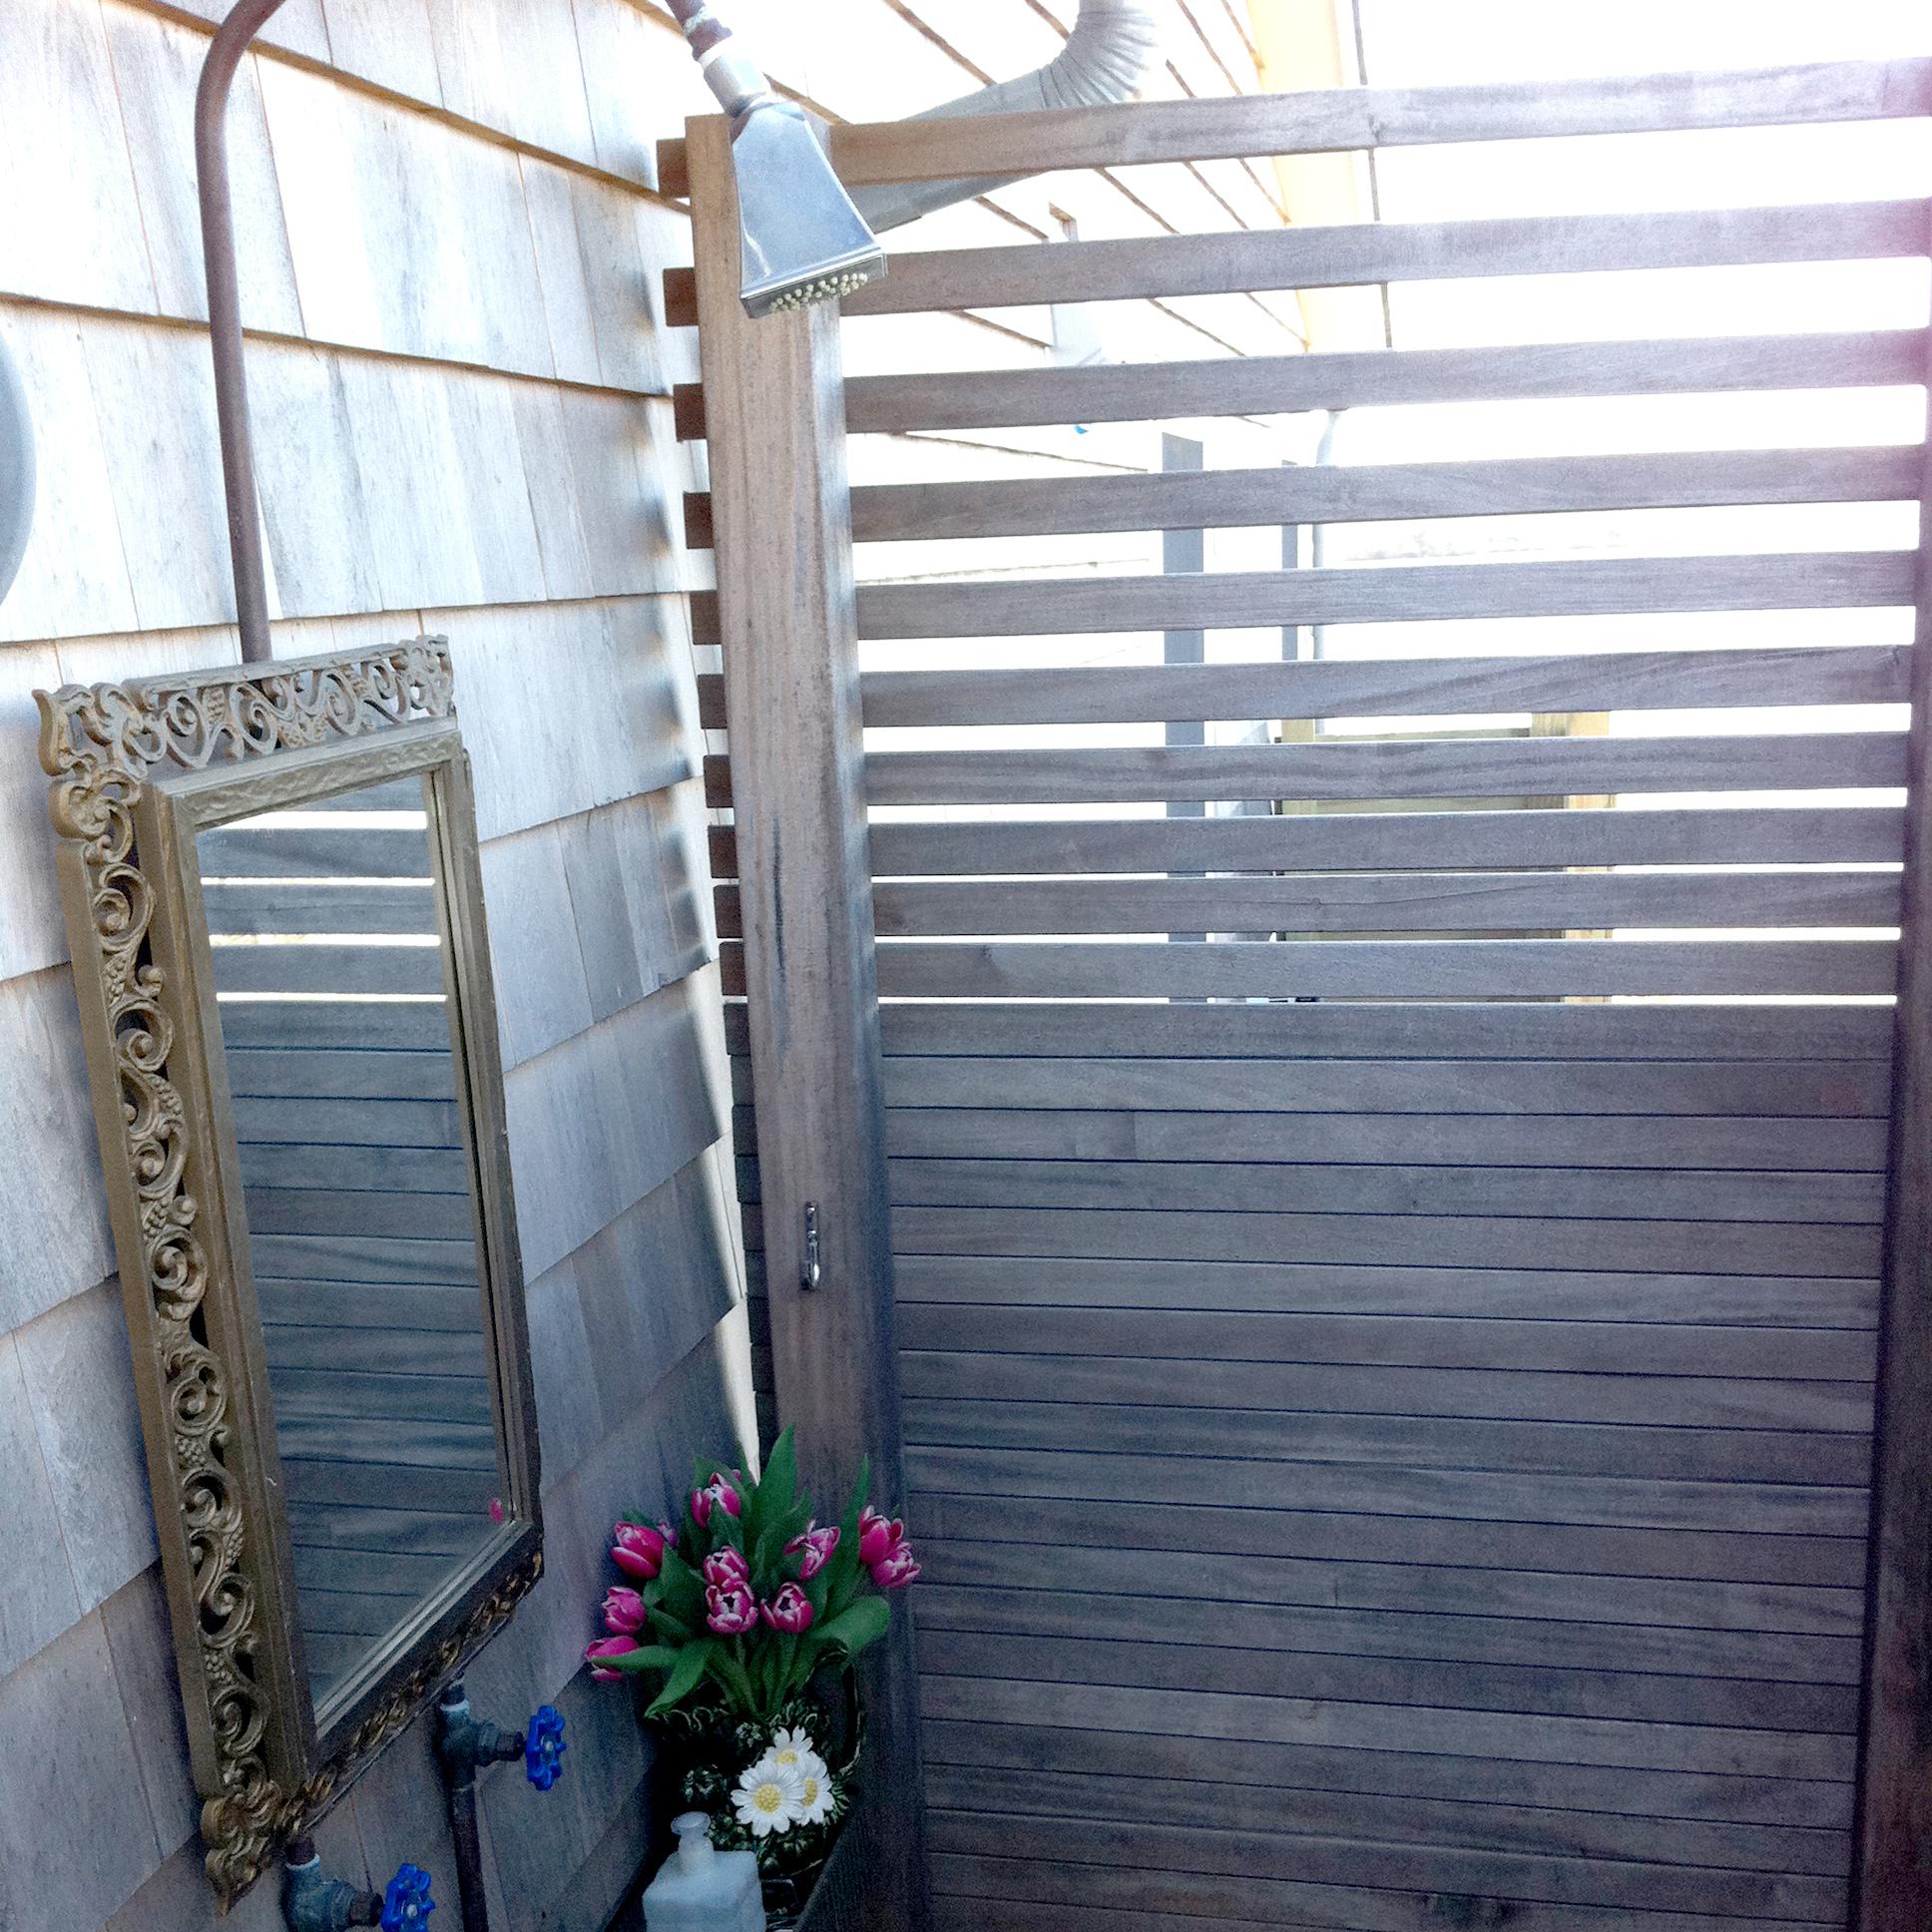 Interior of shower1.jpg